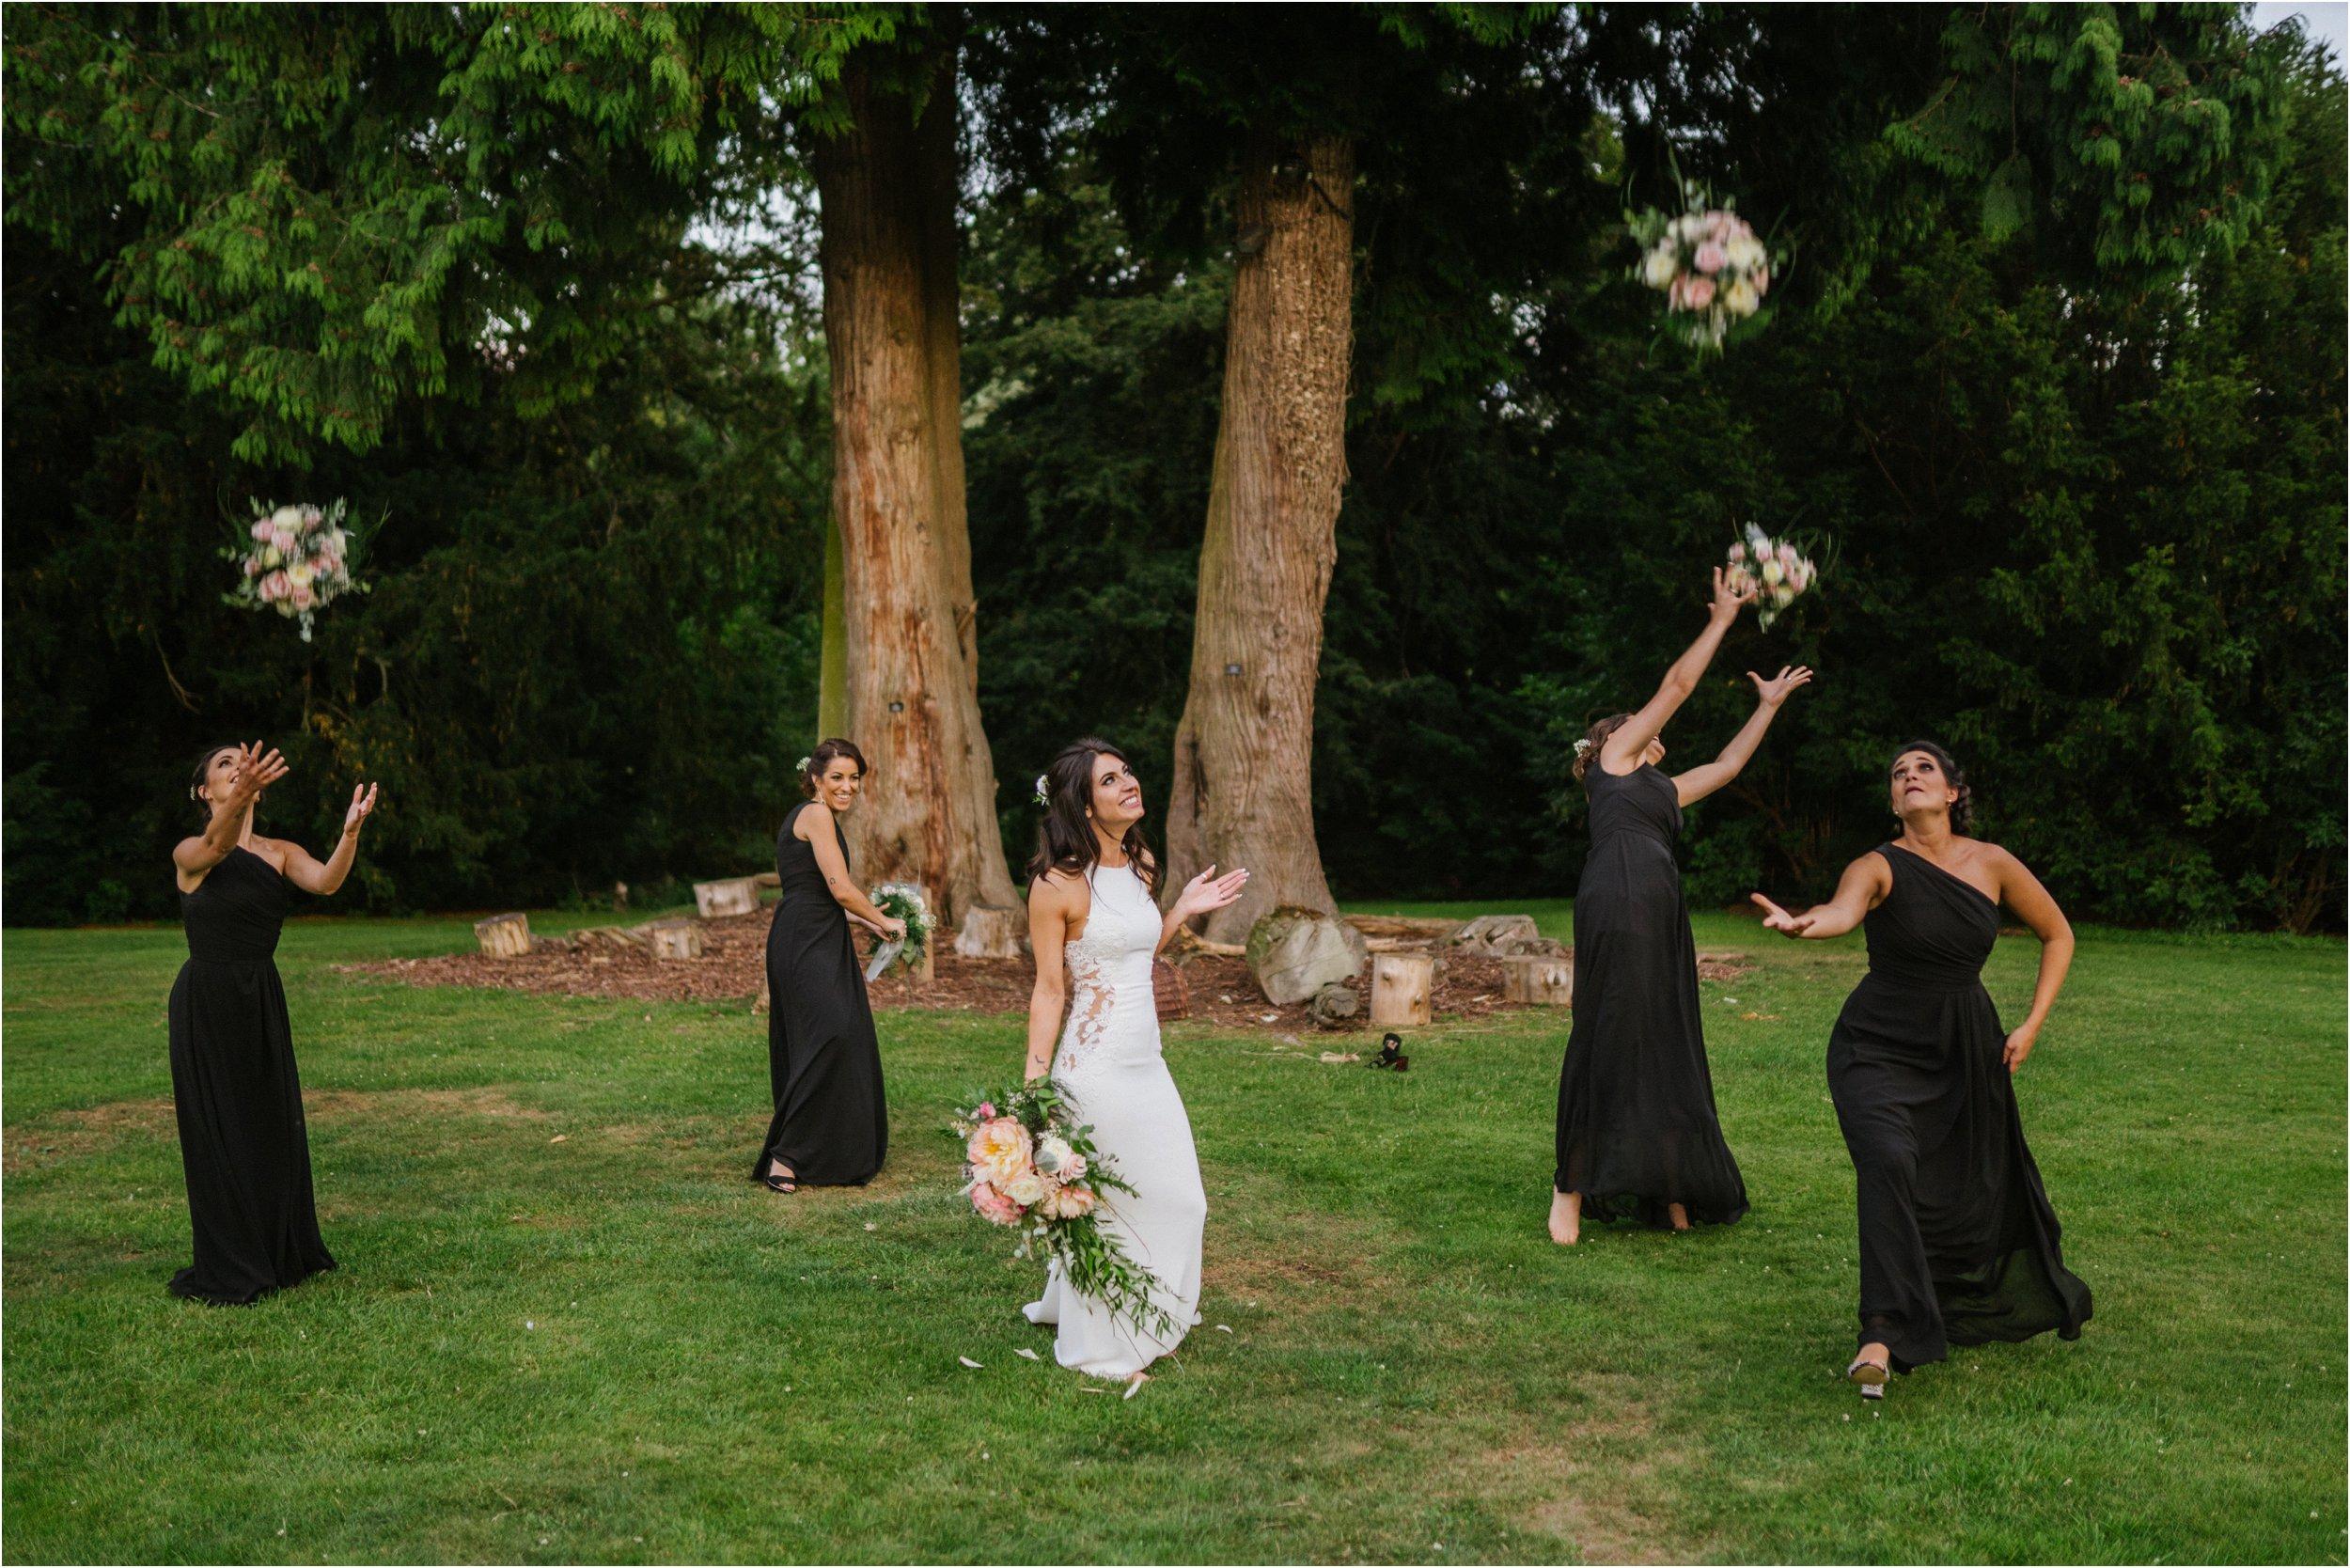 Compton Verney wedding photography_0183.jpg